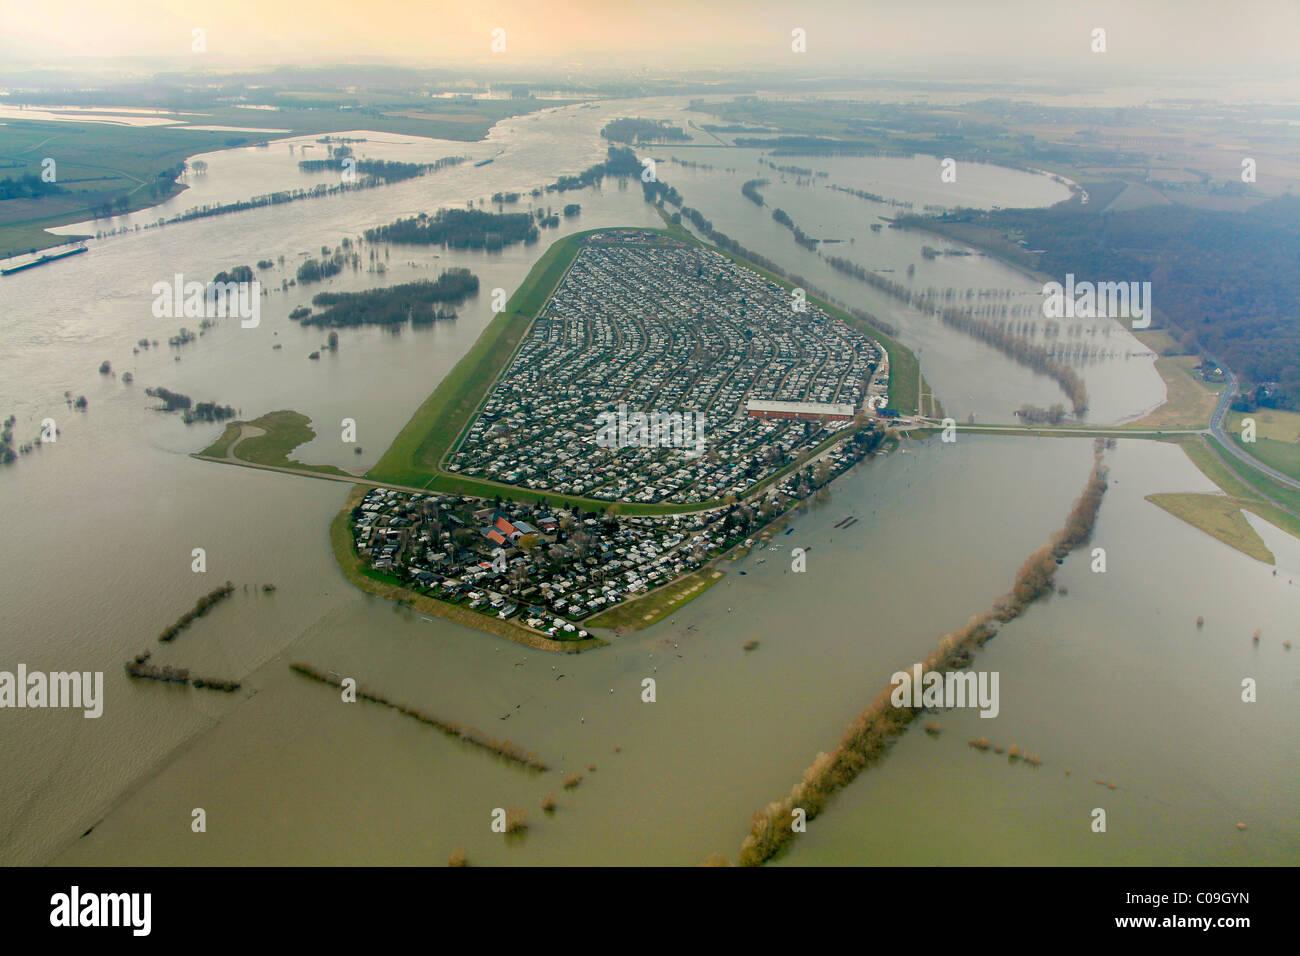 Aerial view, draining off high water, Rhine flood, Kartaeuser camping ground on the Gravinsel island, Wesel, Niederrhein - Stock Image